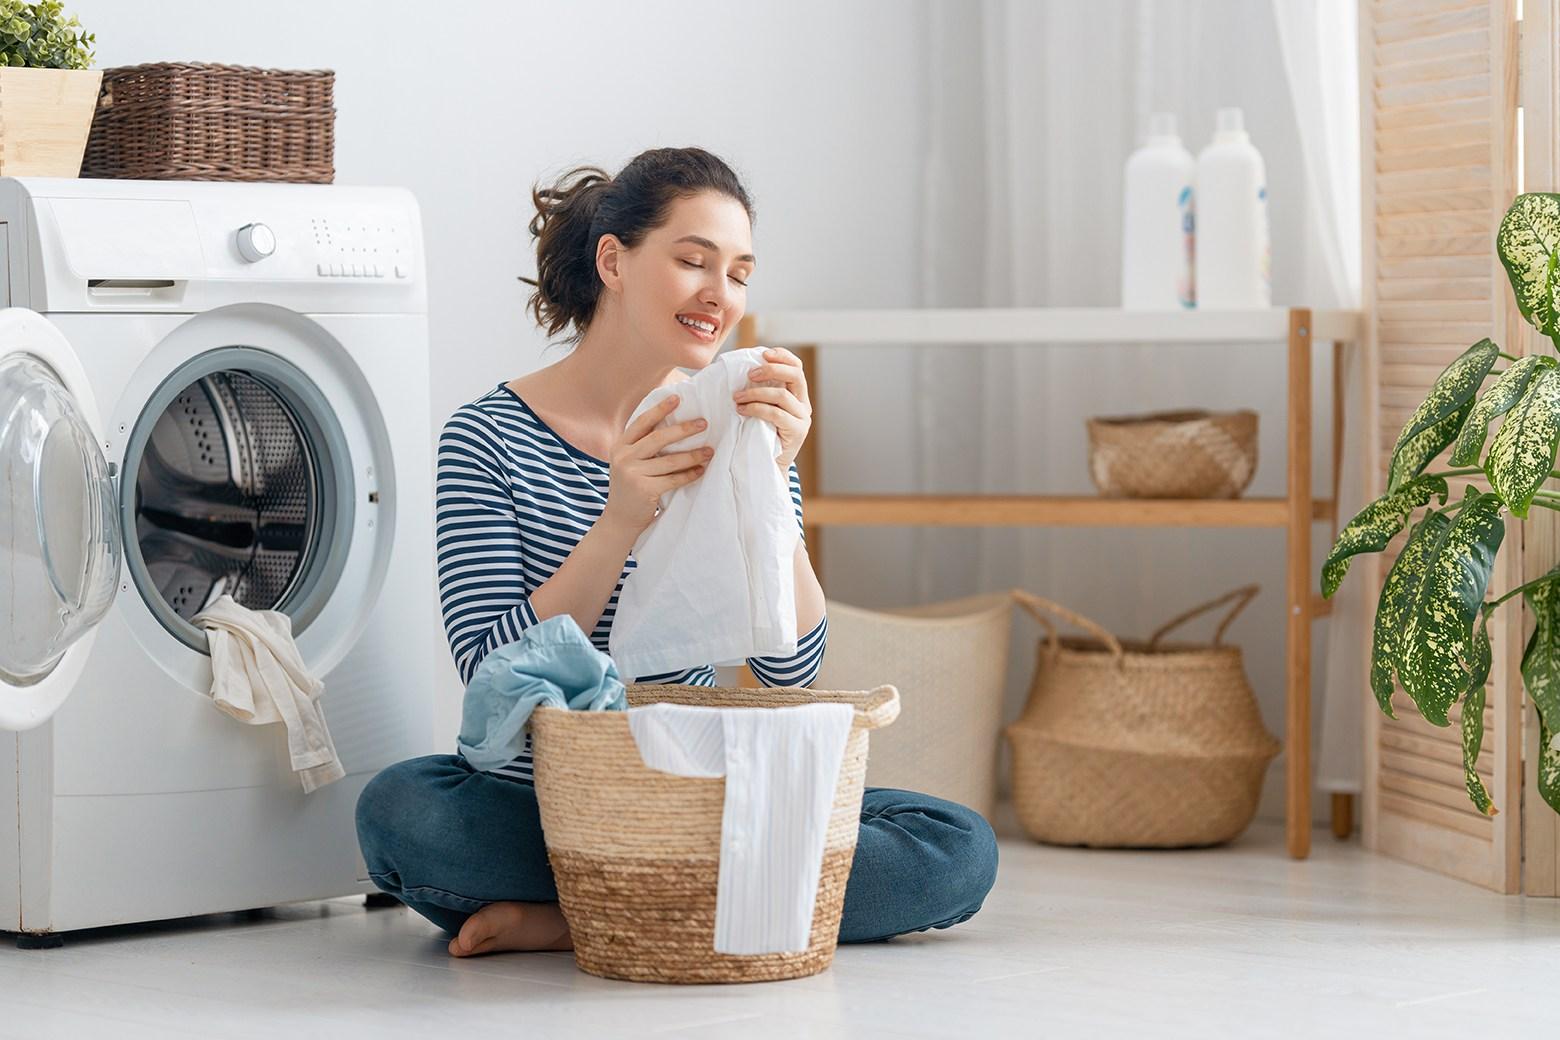 dye-free laundry detergents5